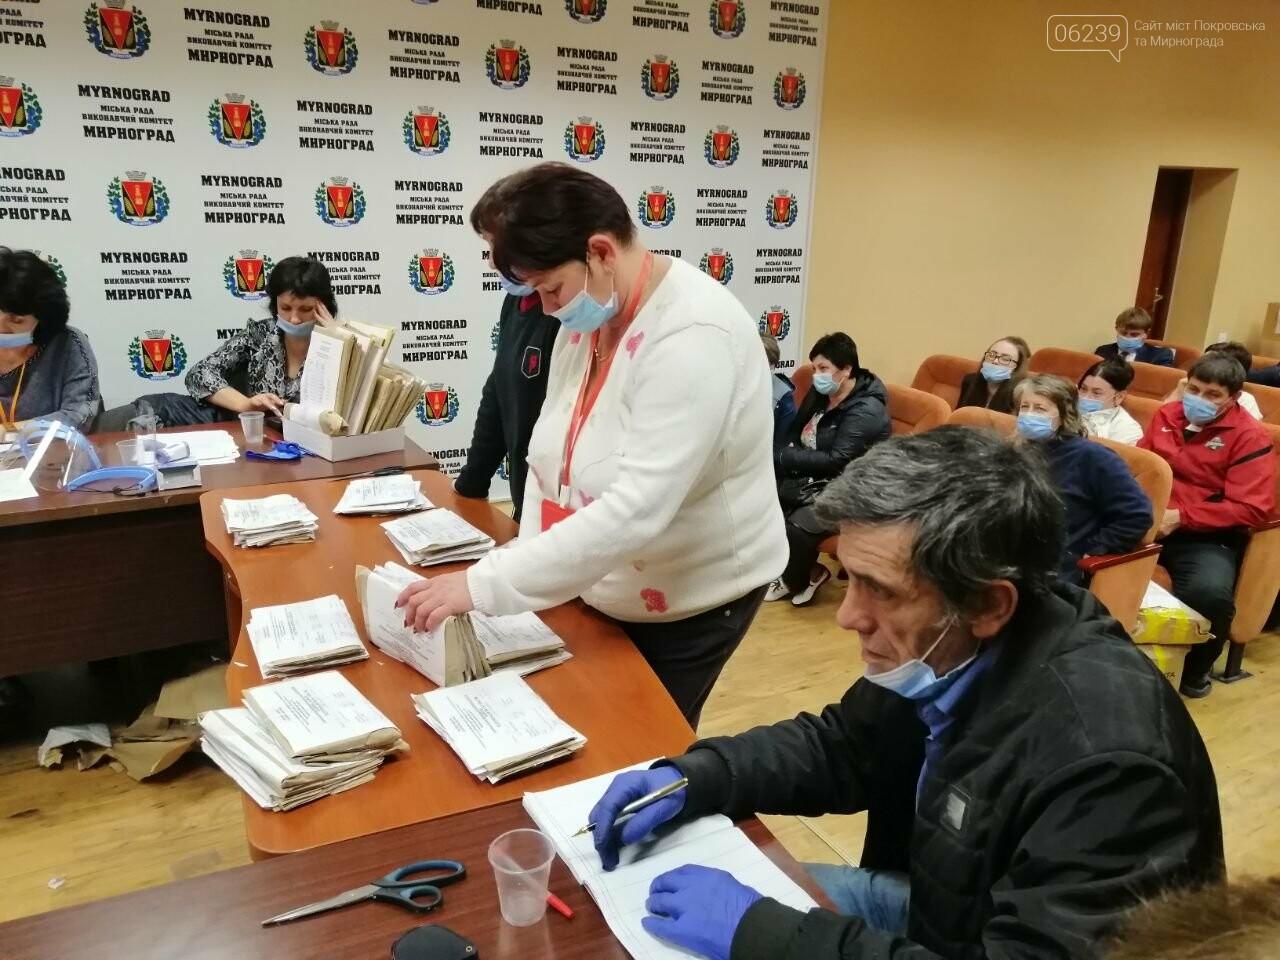 Мирноградская ТИК по состоянию на 18.00 получила бюллетени от 15 участков, фото-1